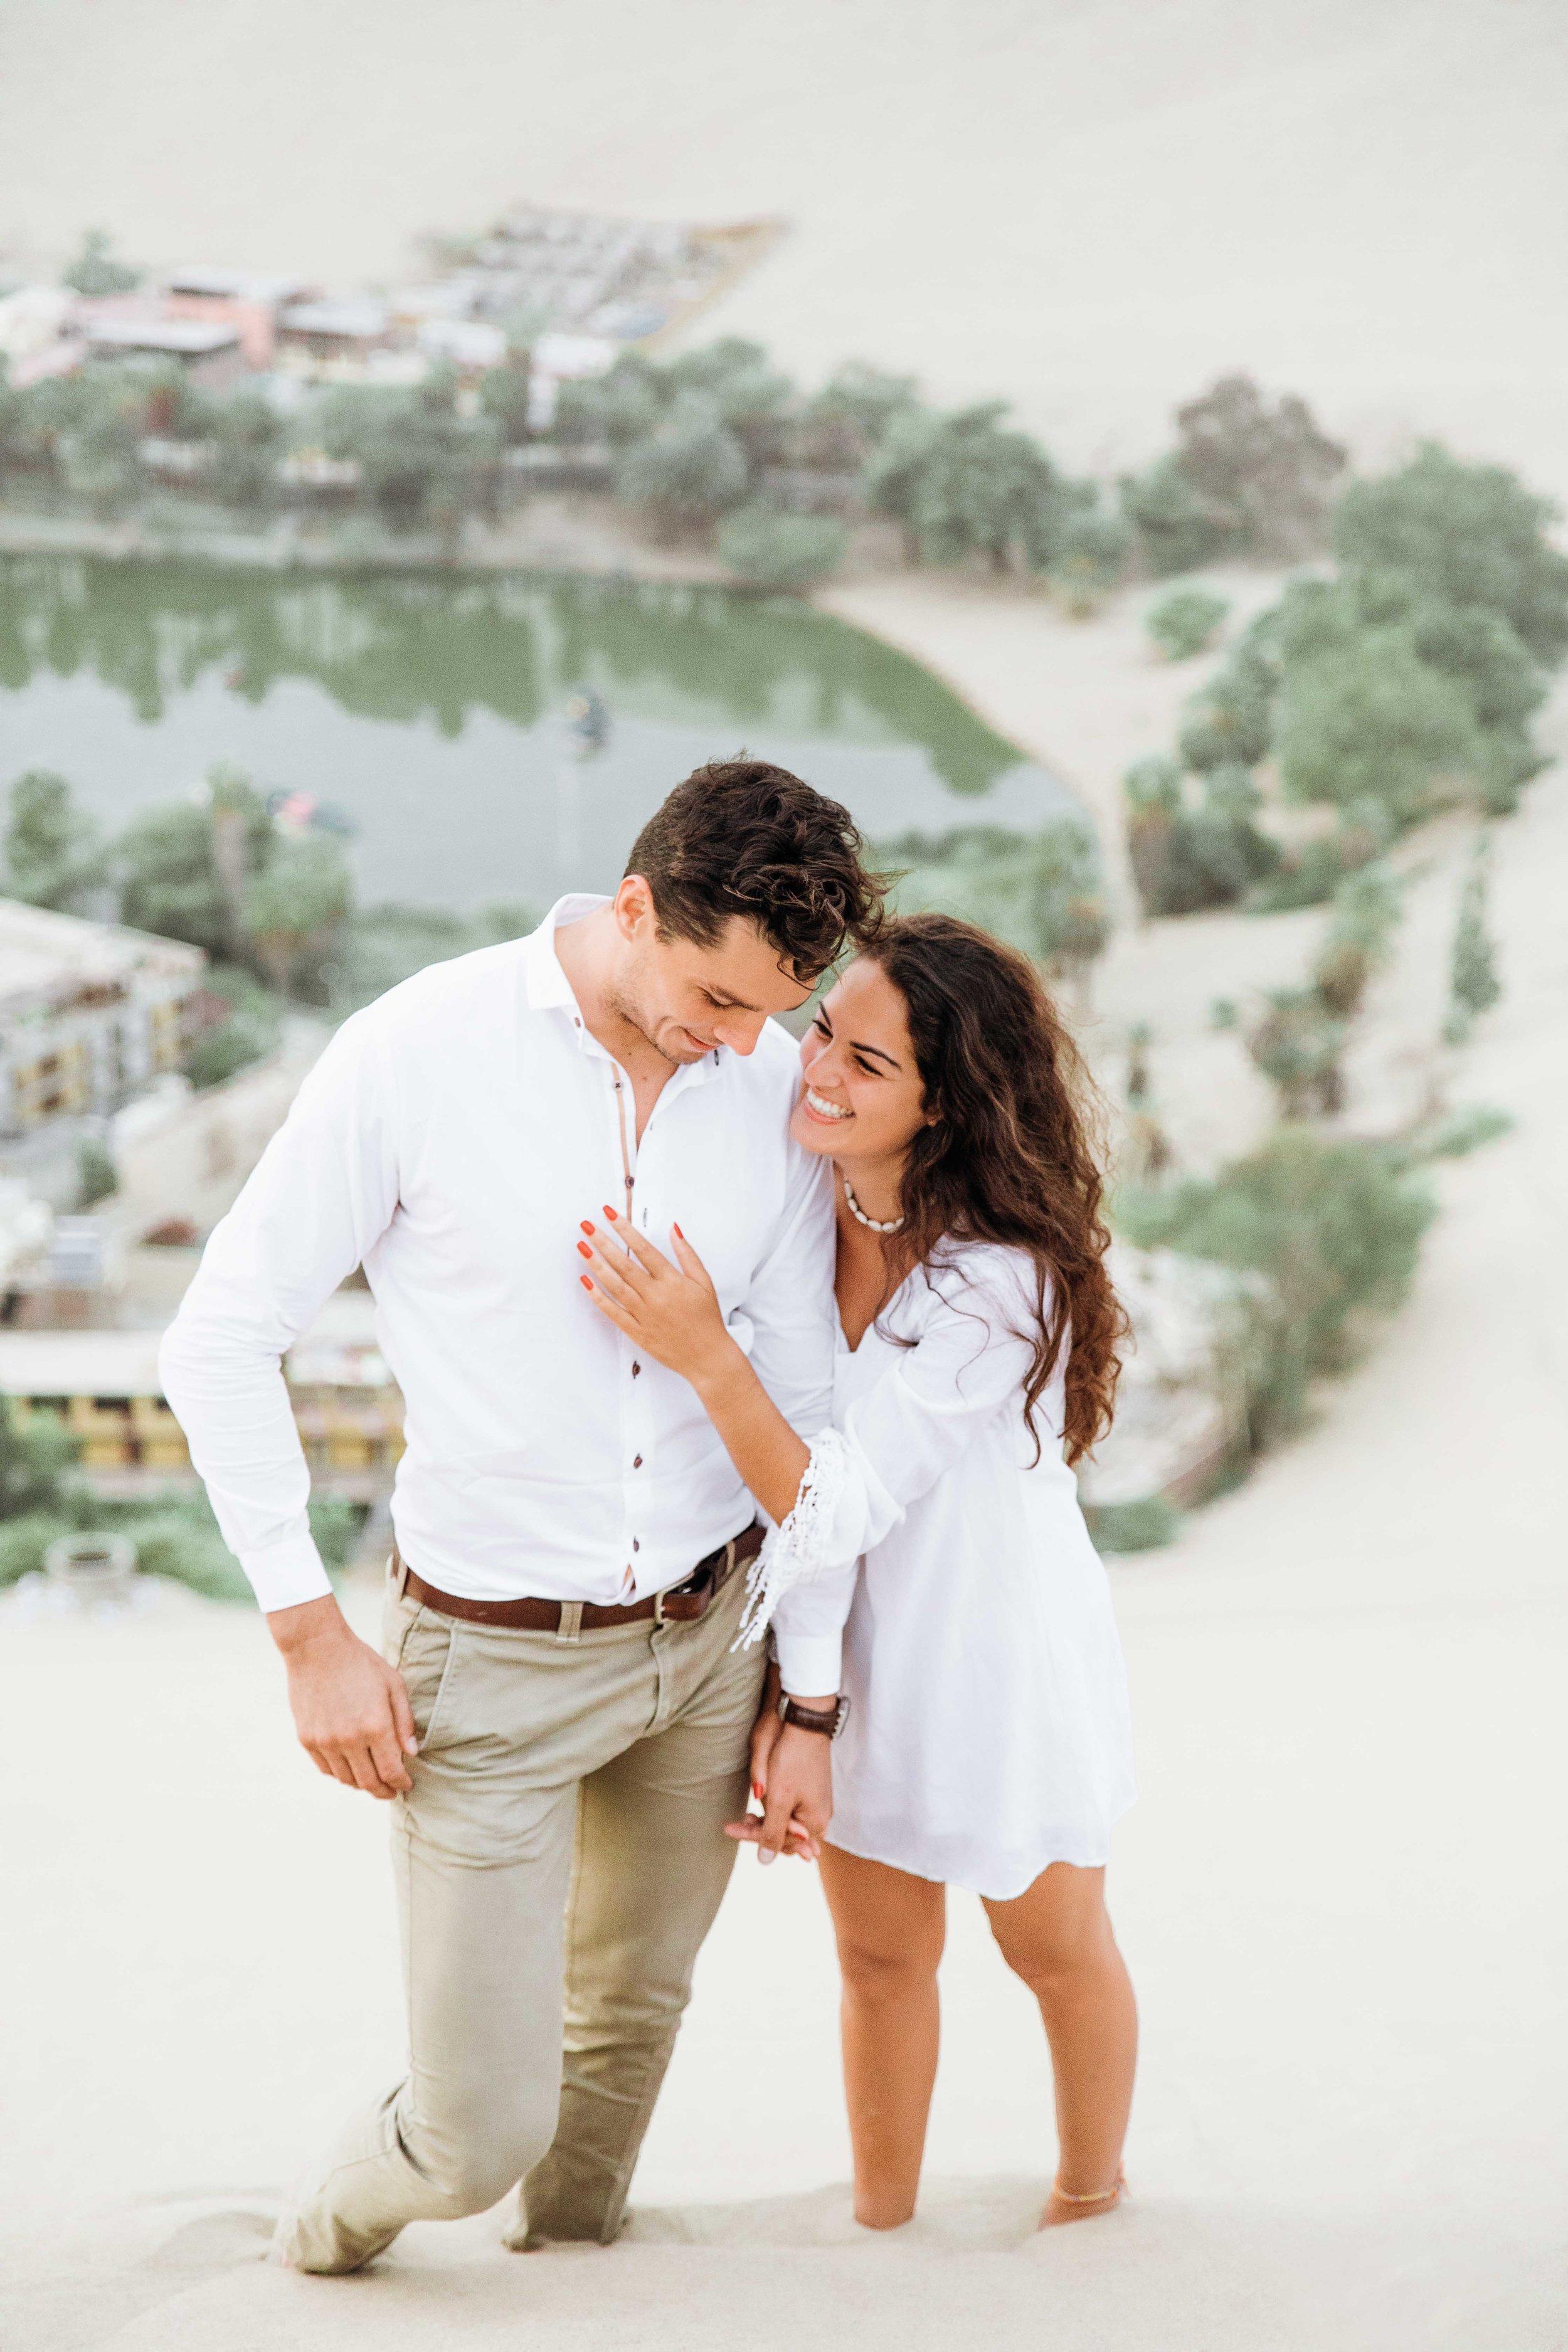 huacachina-peru-honeymoon-elopement-destination-wedding-photography-michael-cozzens-11.jpg